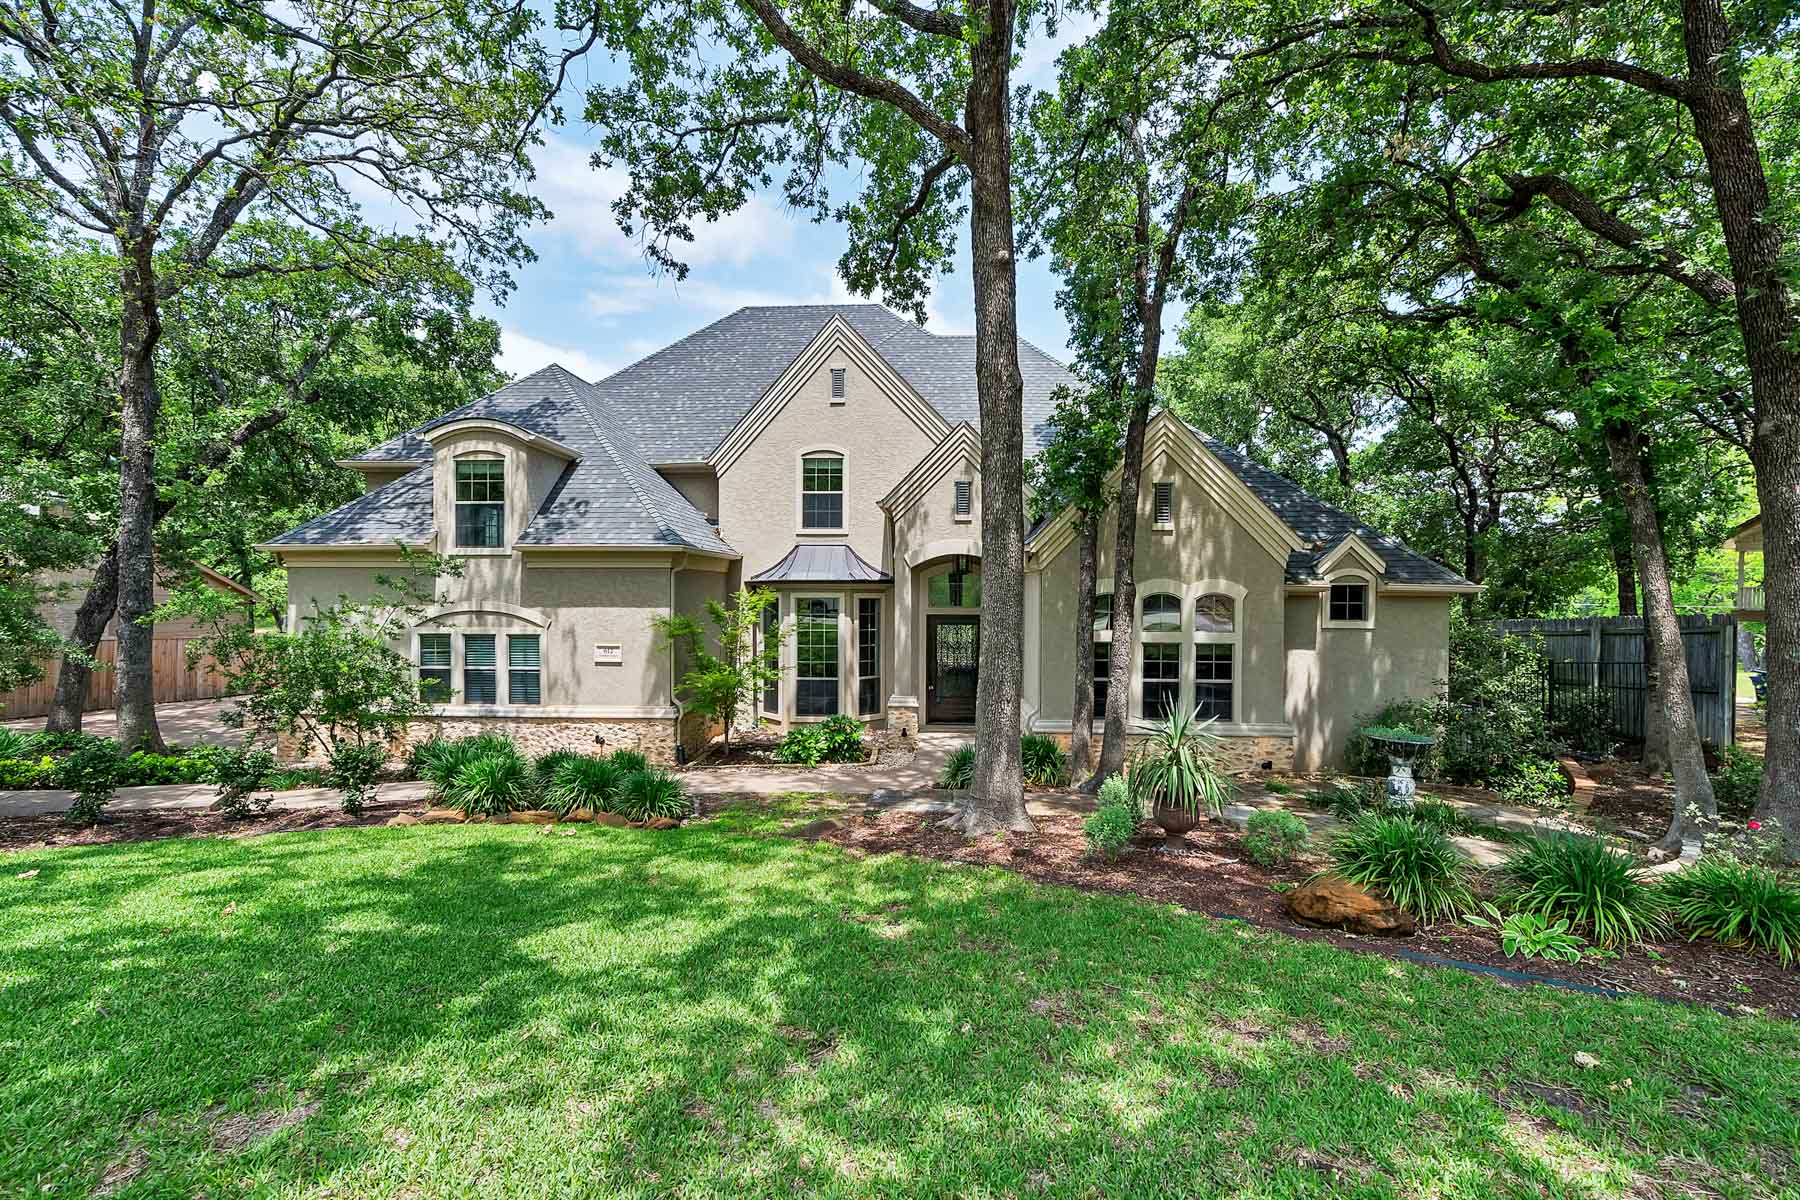 Частный односемейный дом для того Продажа на Newly Remodeled with acreage in Colleyville! 612 Frontier Ct Colleyville, Техас, 76034 Соединенные Штаты